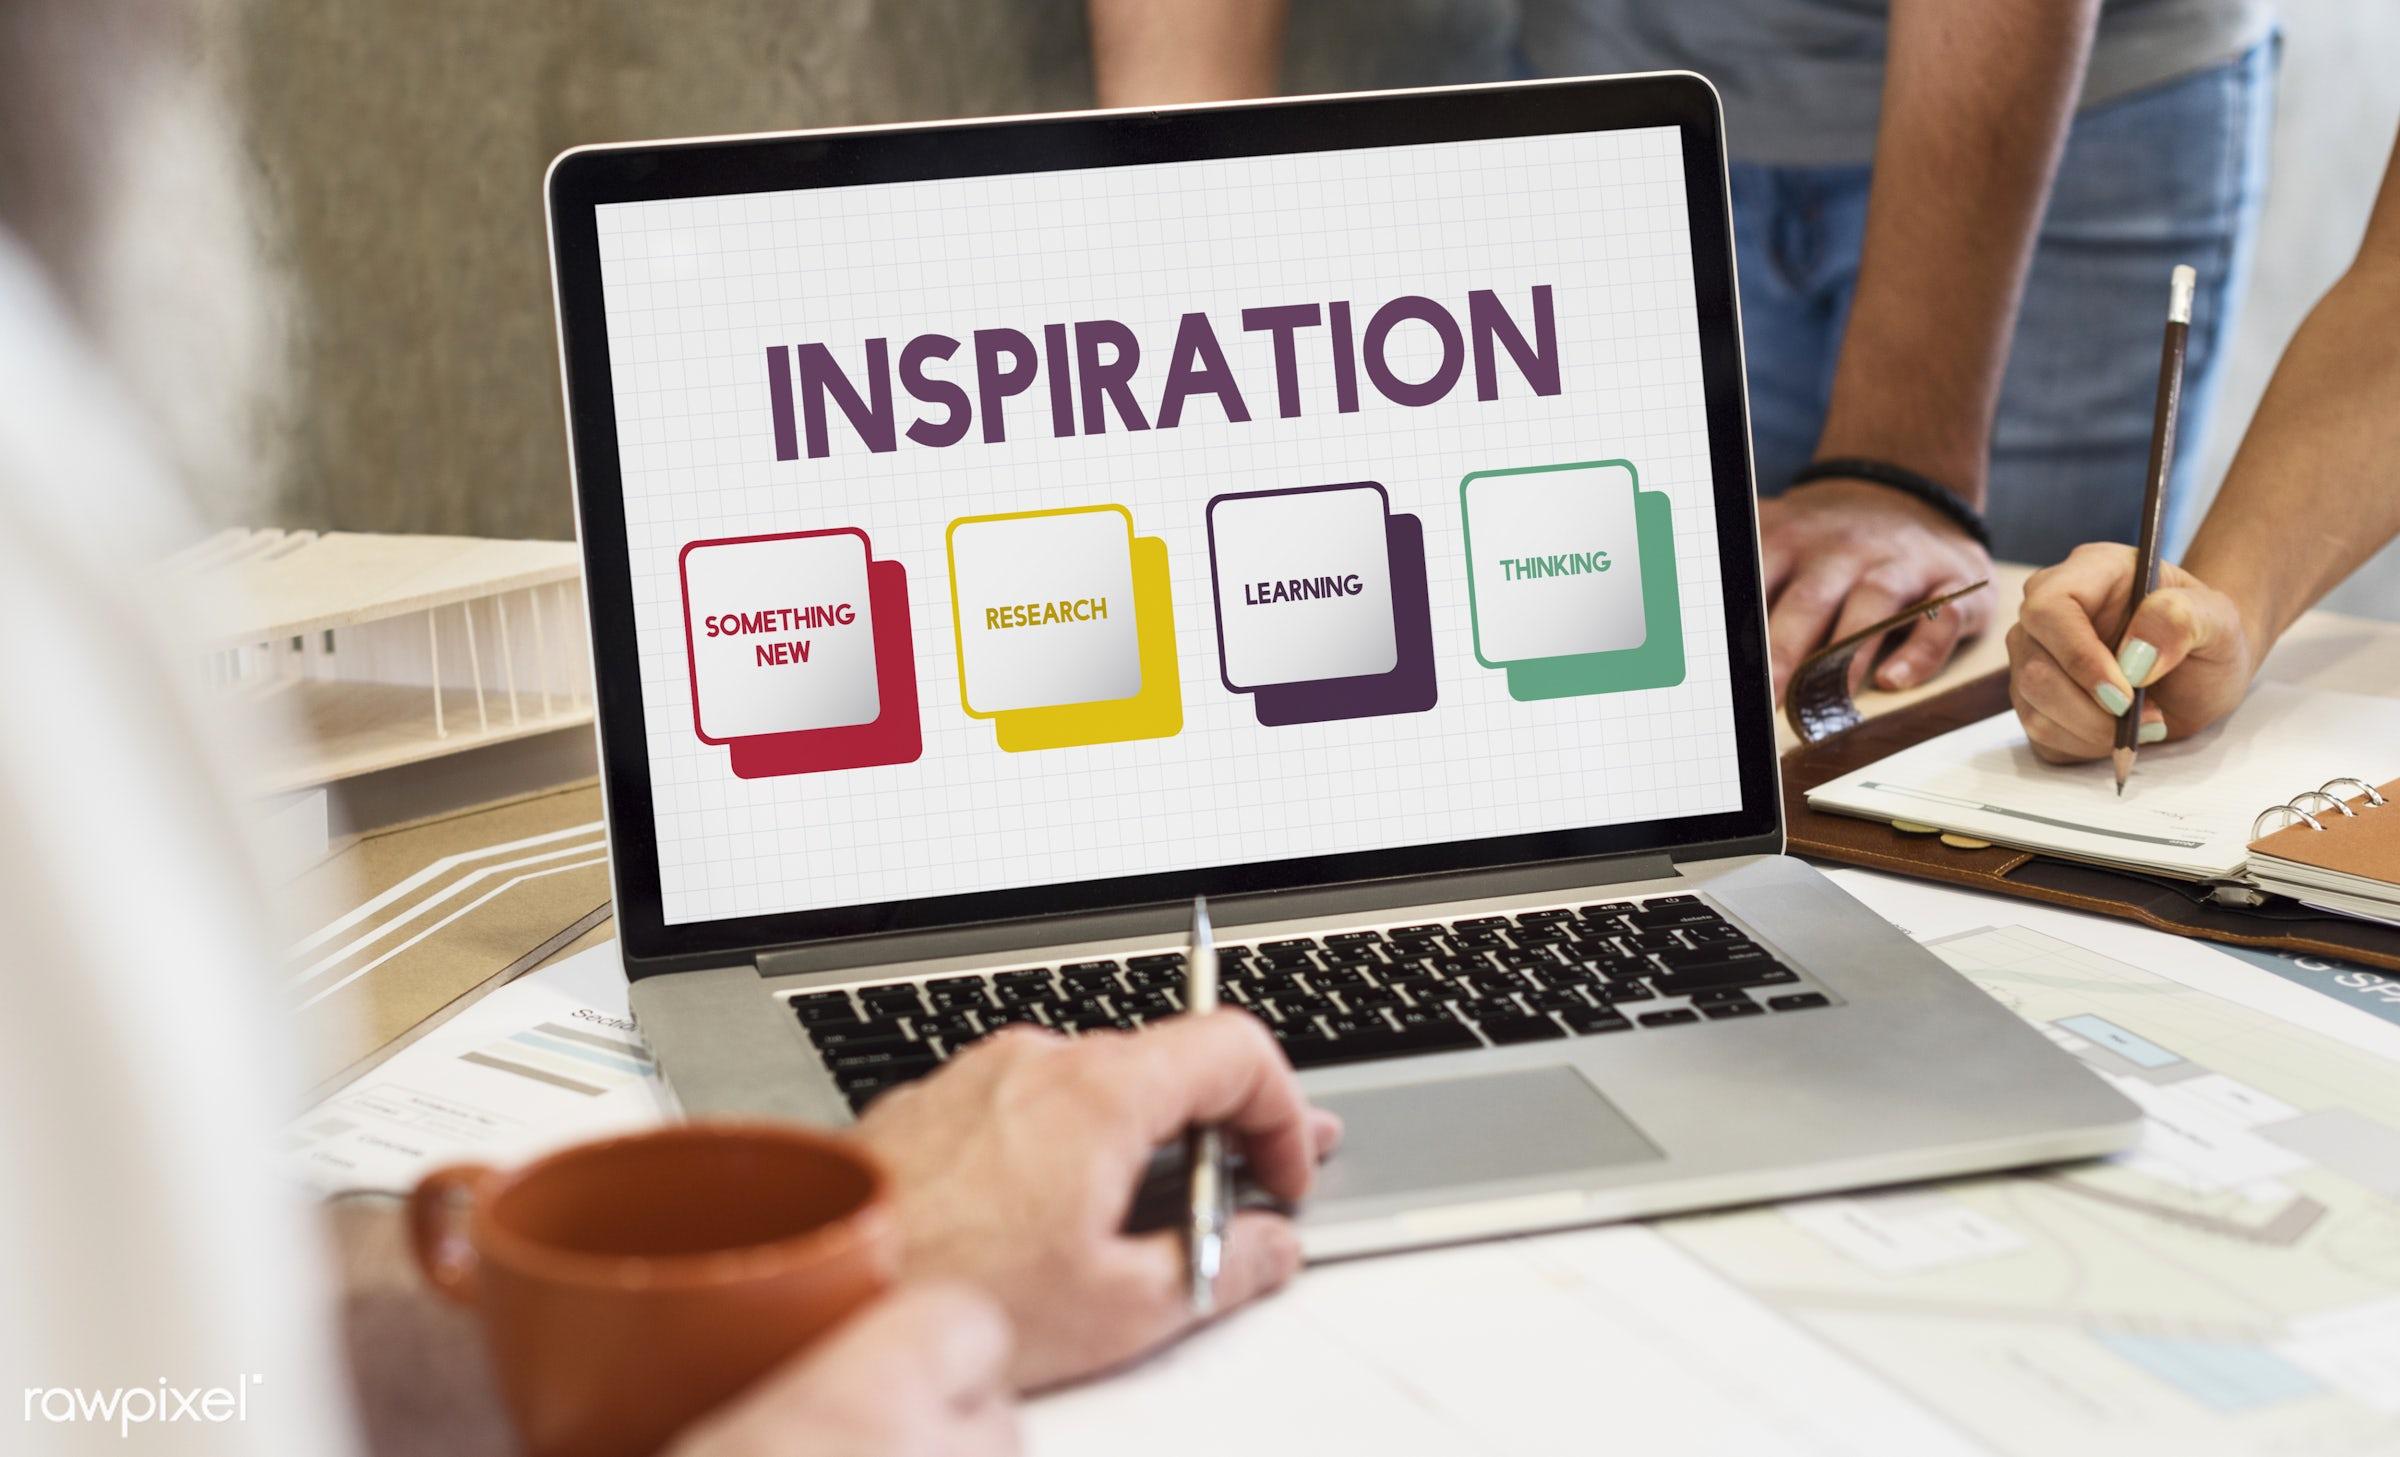 architect, architecture, be creative, brainstorm, brainstorming, business, coffee, coffee cup, creativeness, creativity, cup...